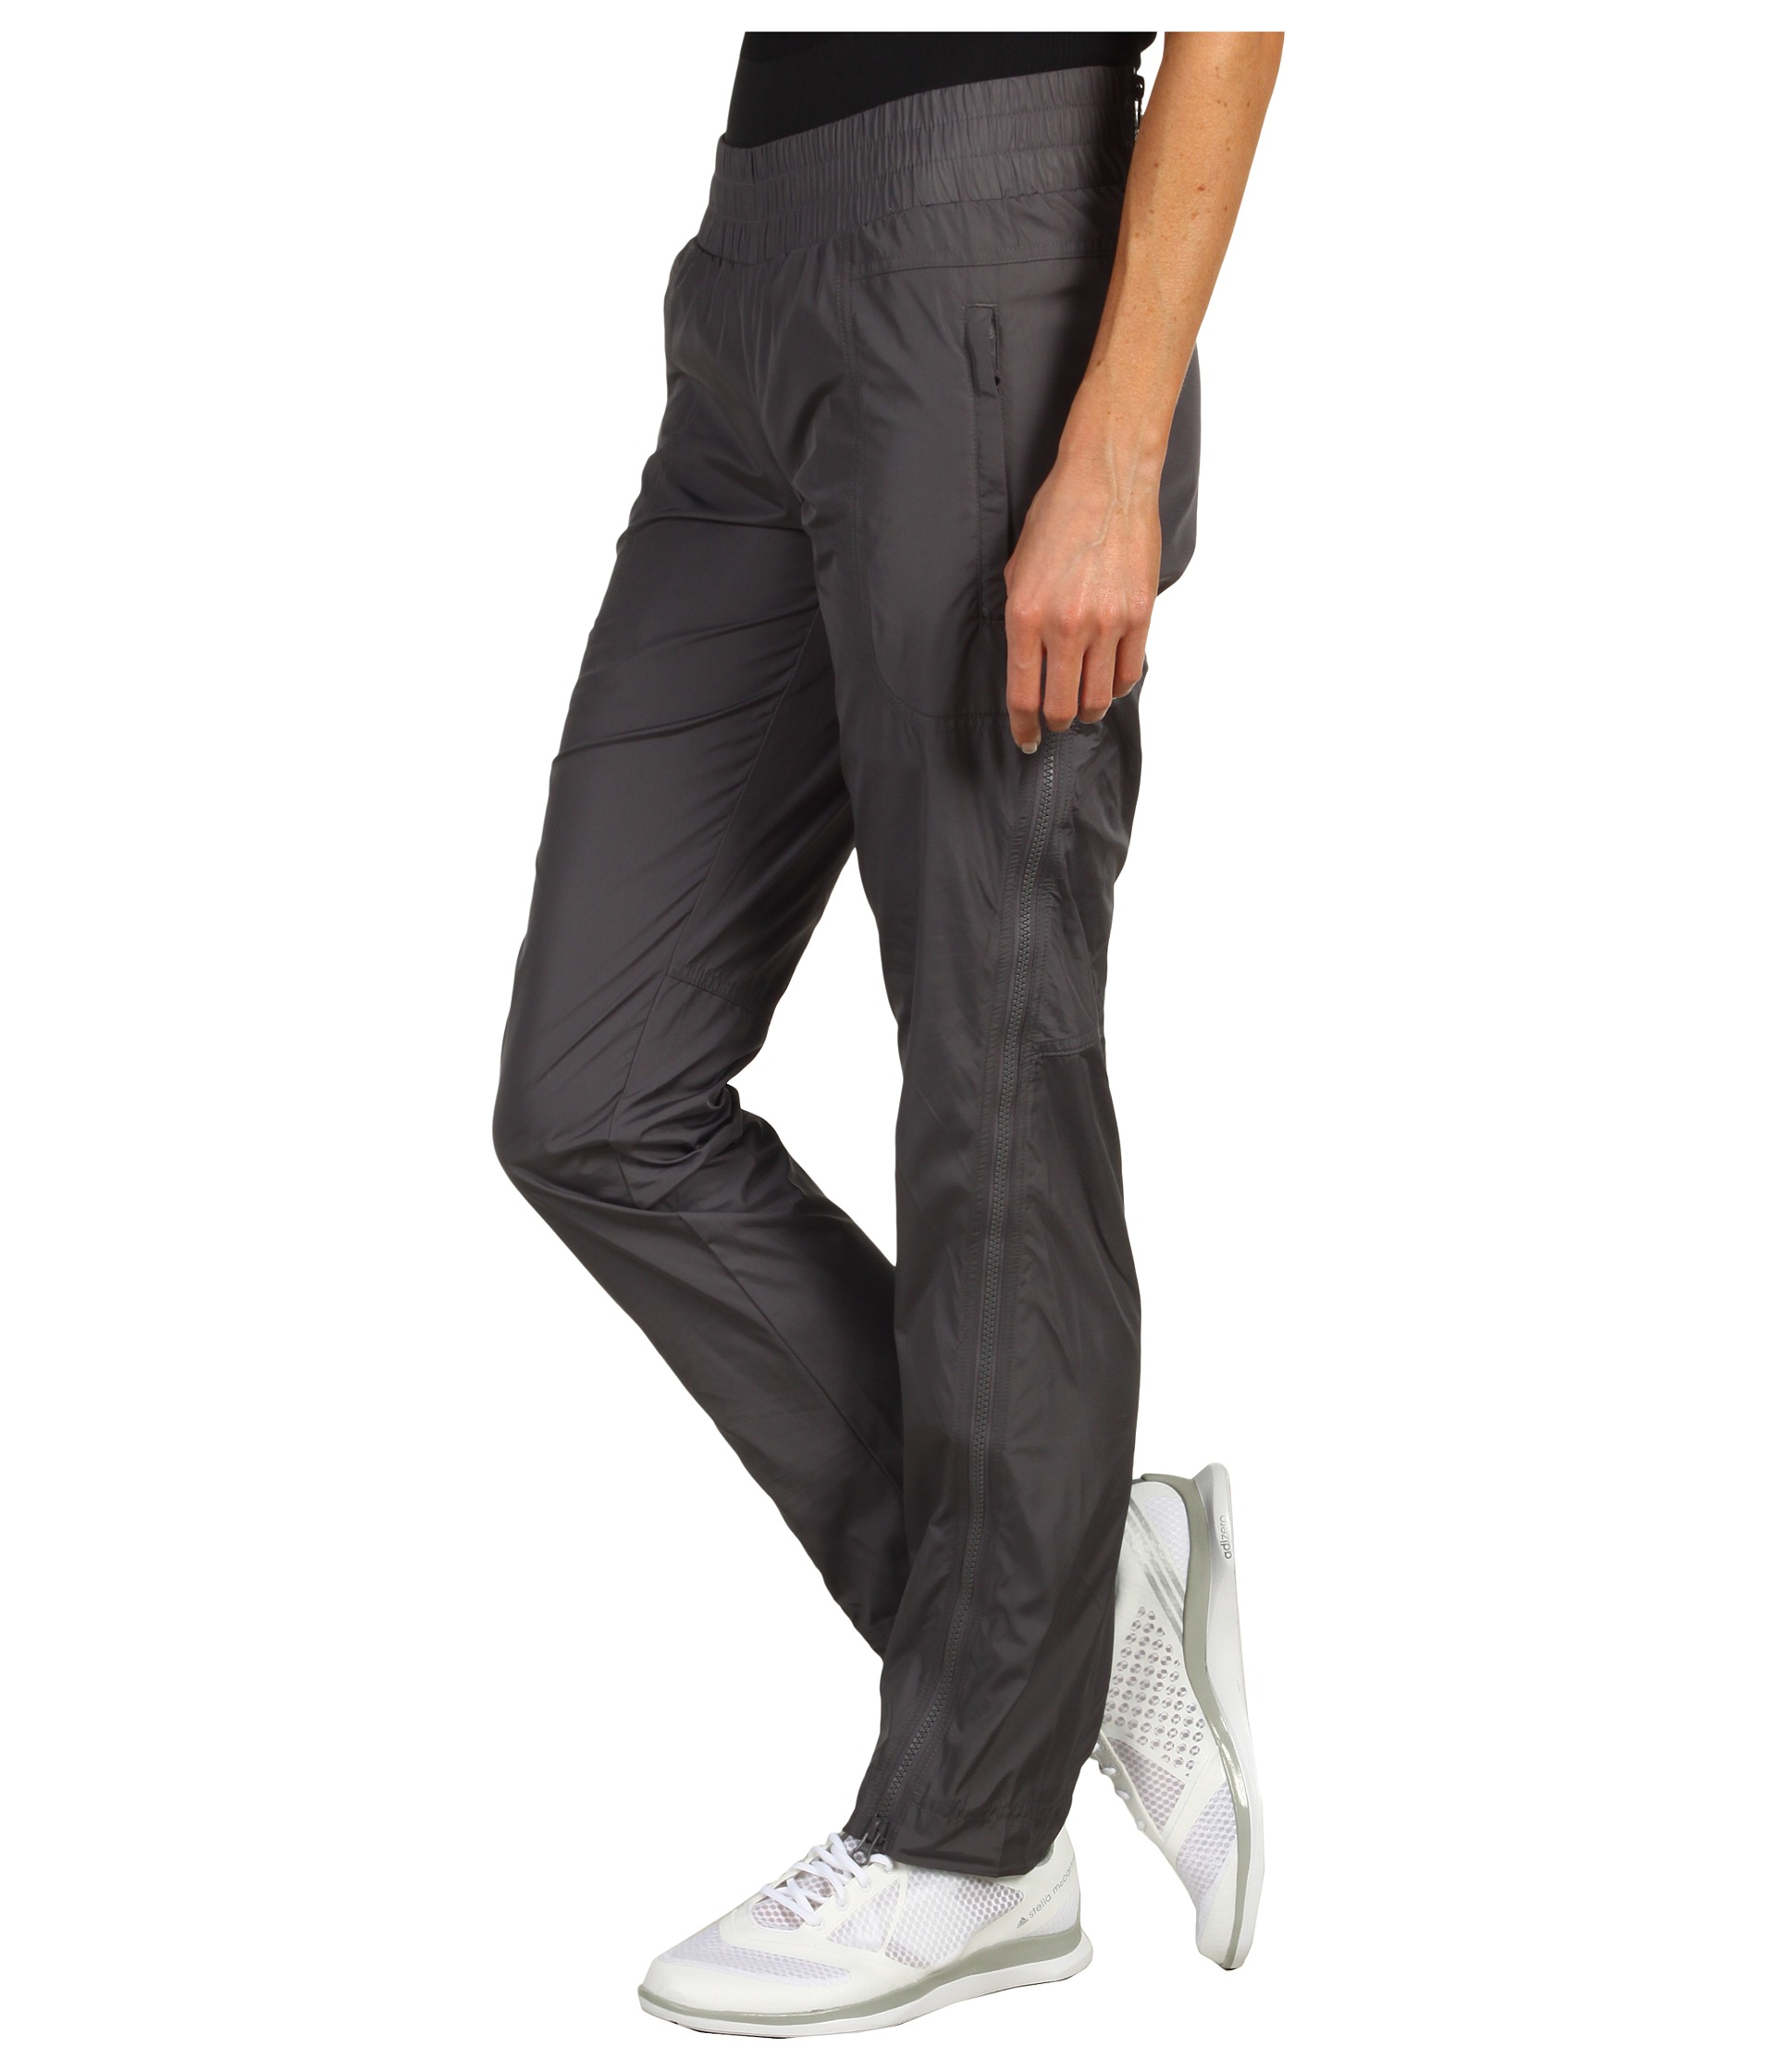 Adidas Stella McCartney Studio Woven Pants Side View